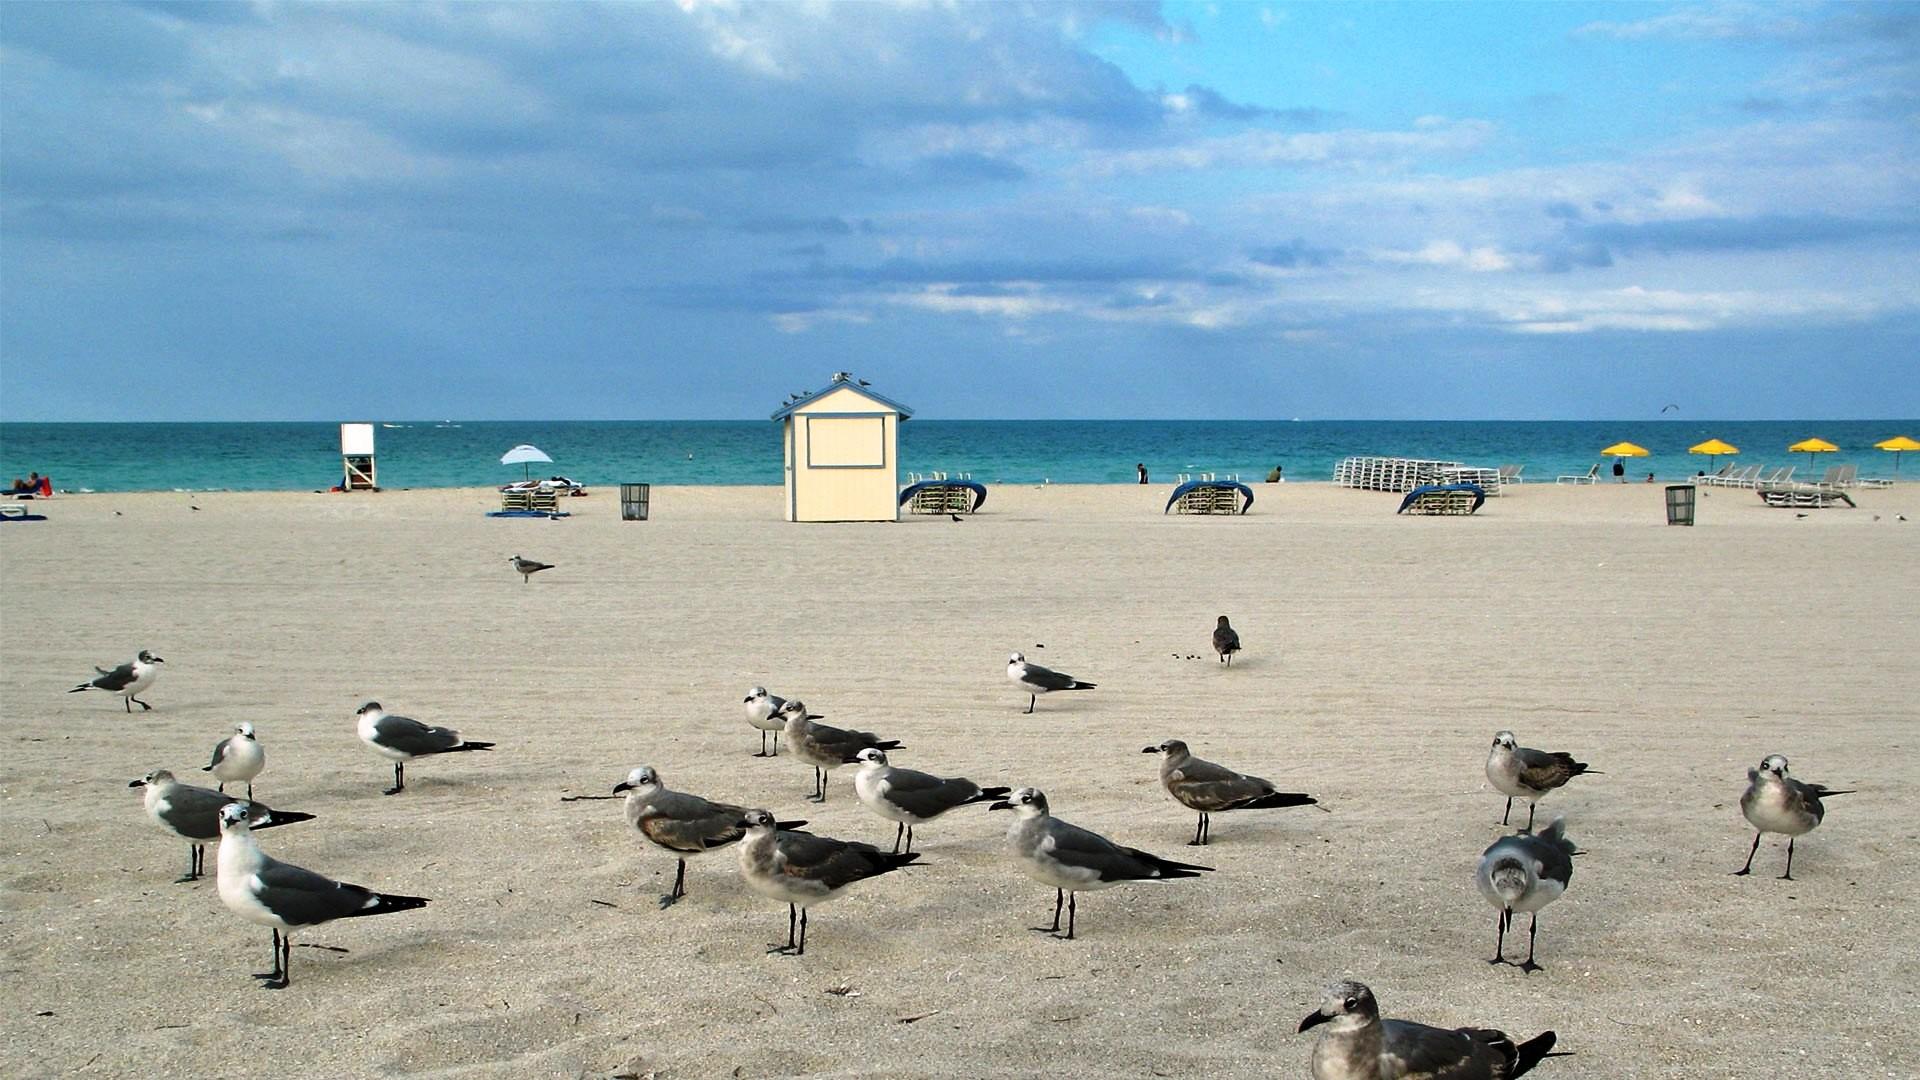 Miami   Miami Beach Florida USA HD Wallpaper Miami Beach Florida USA    powermia4u2   Pinterest   Miami, Miami beach and Sunny beach